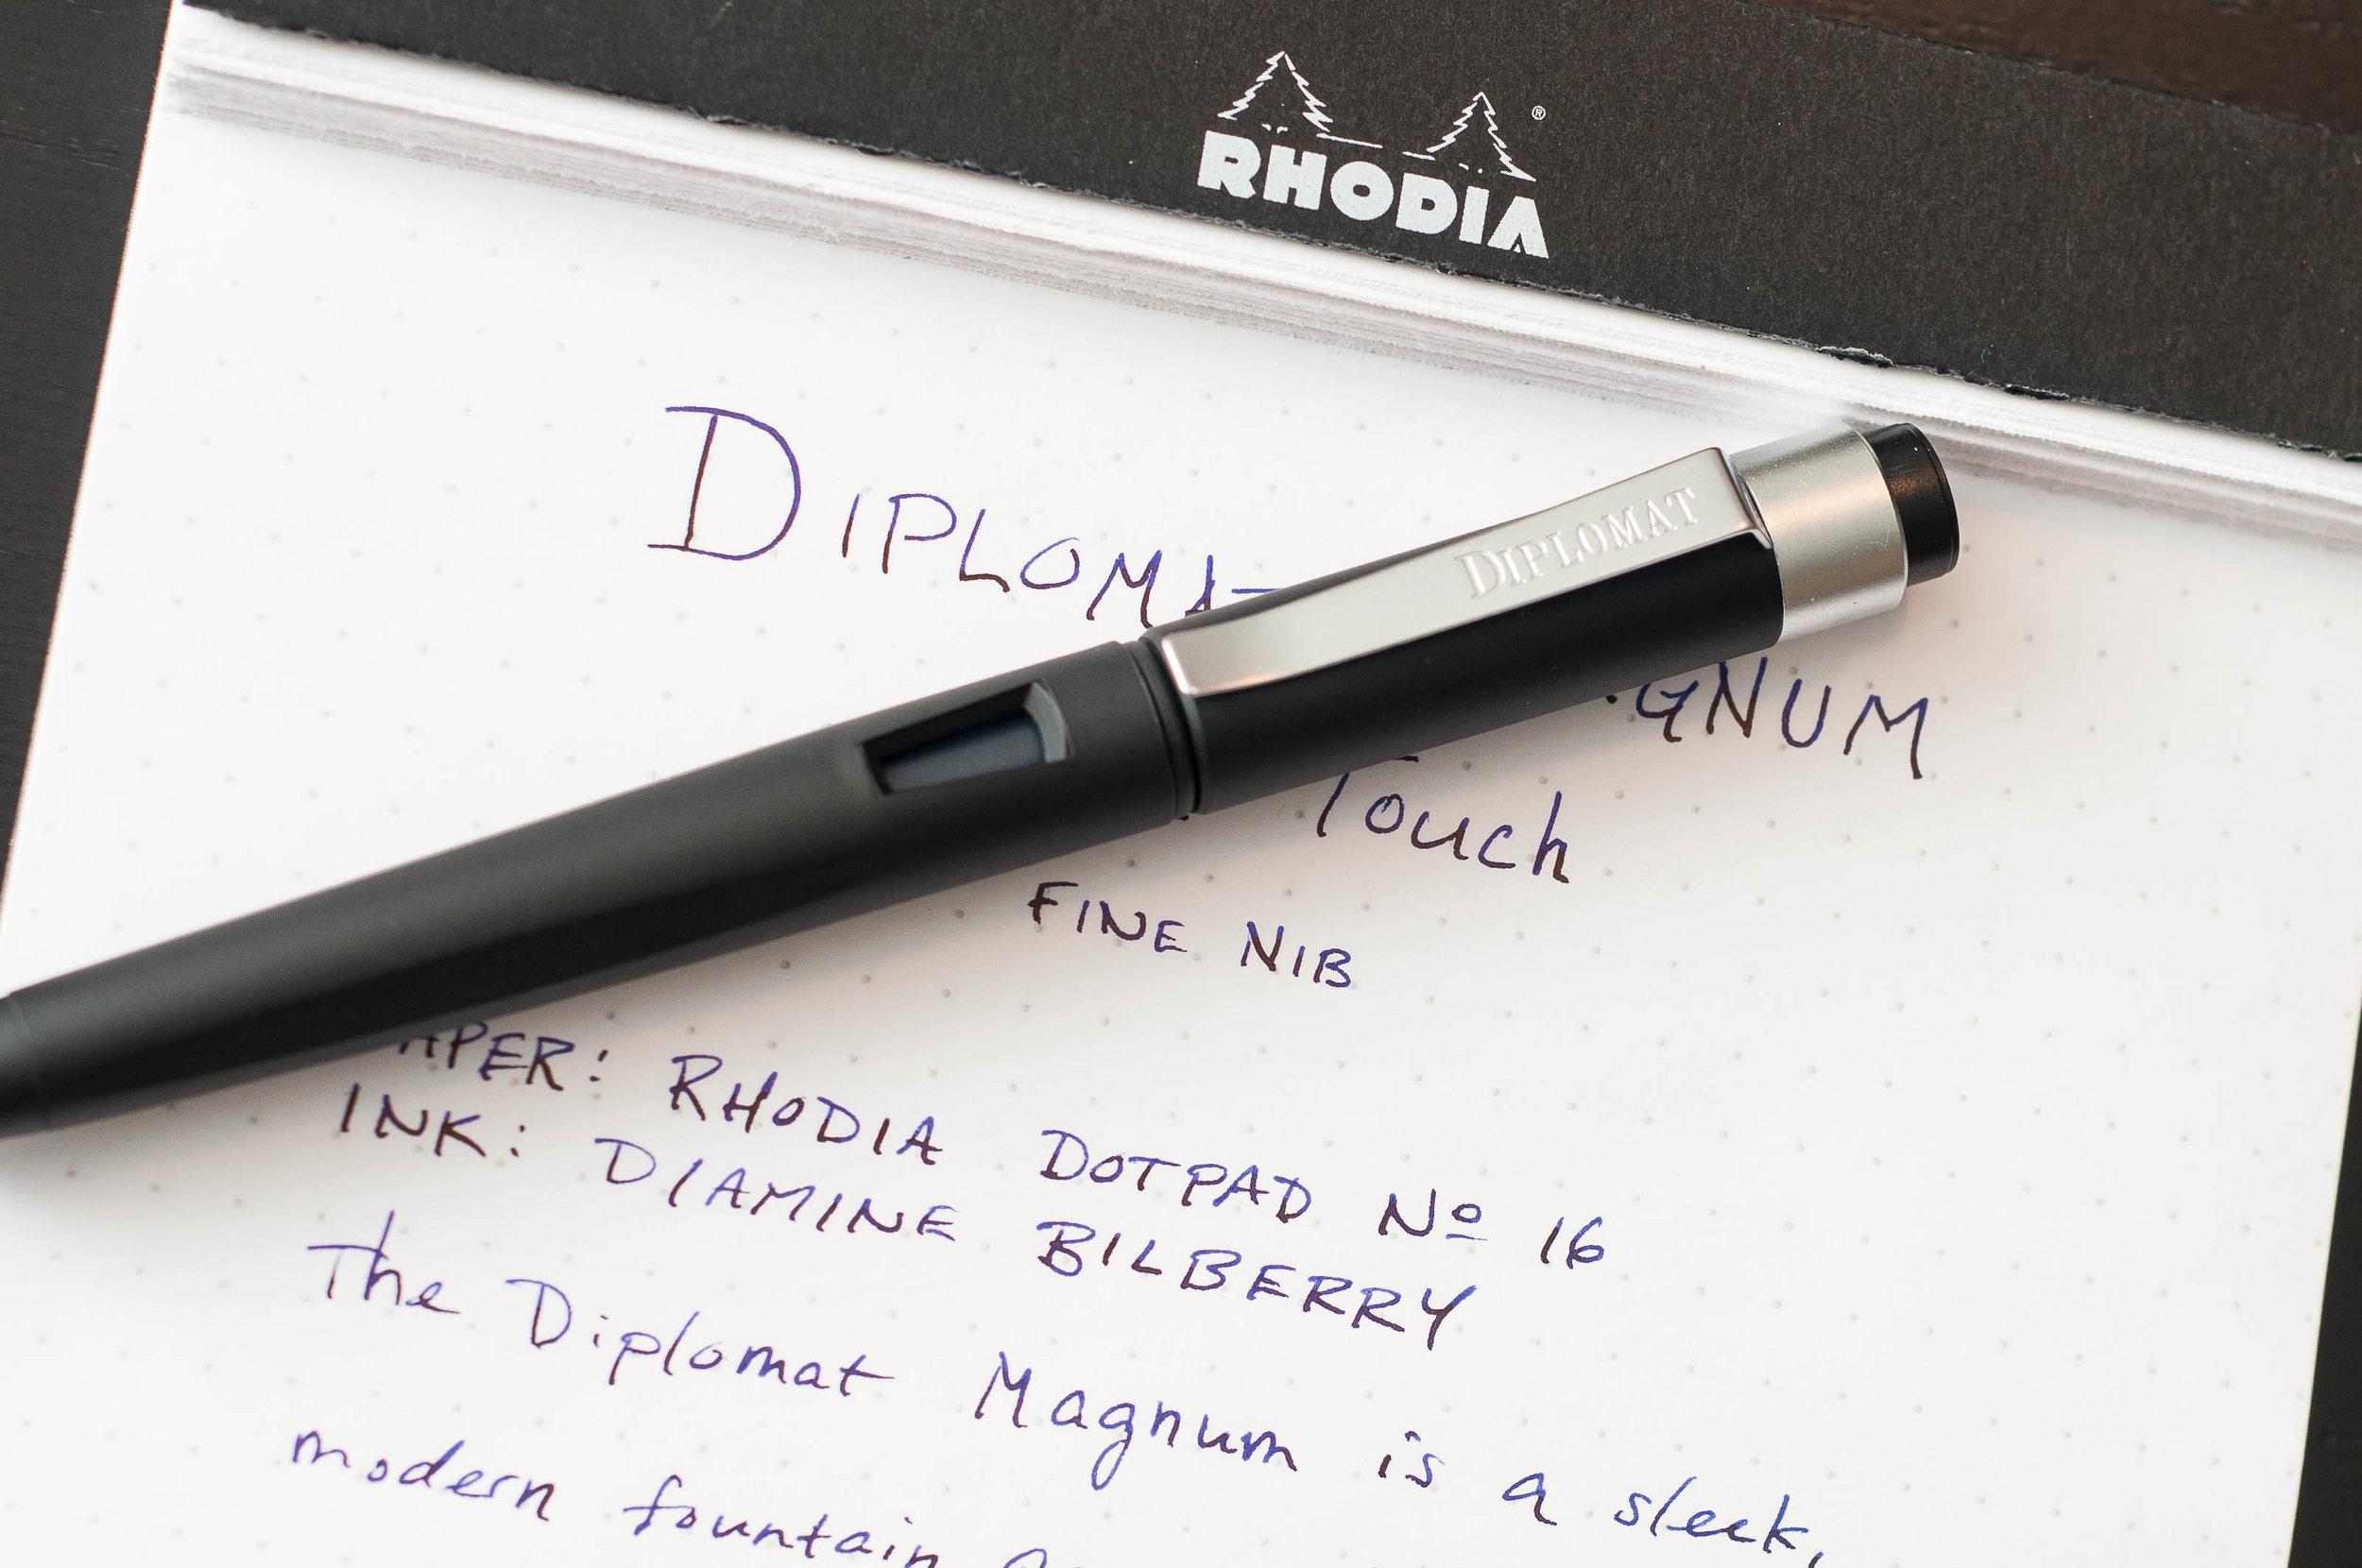 Diplomat Magnum Fountain Pen Clip